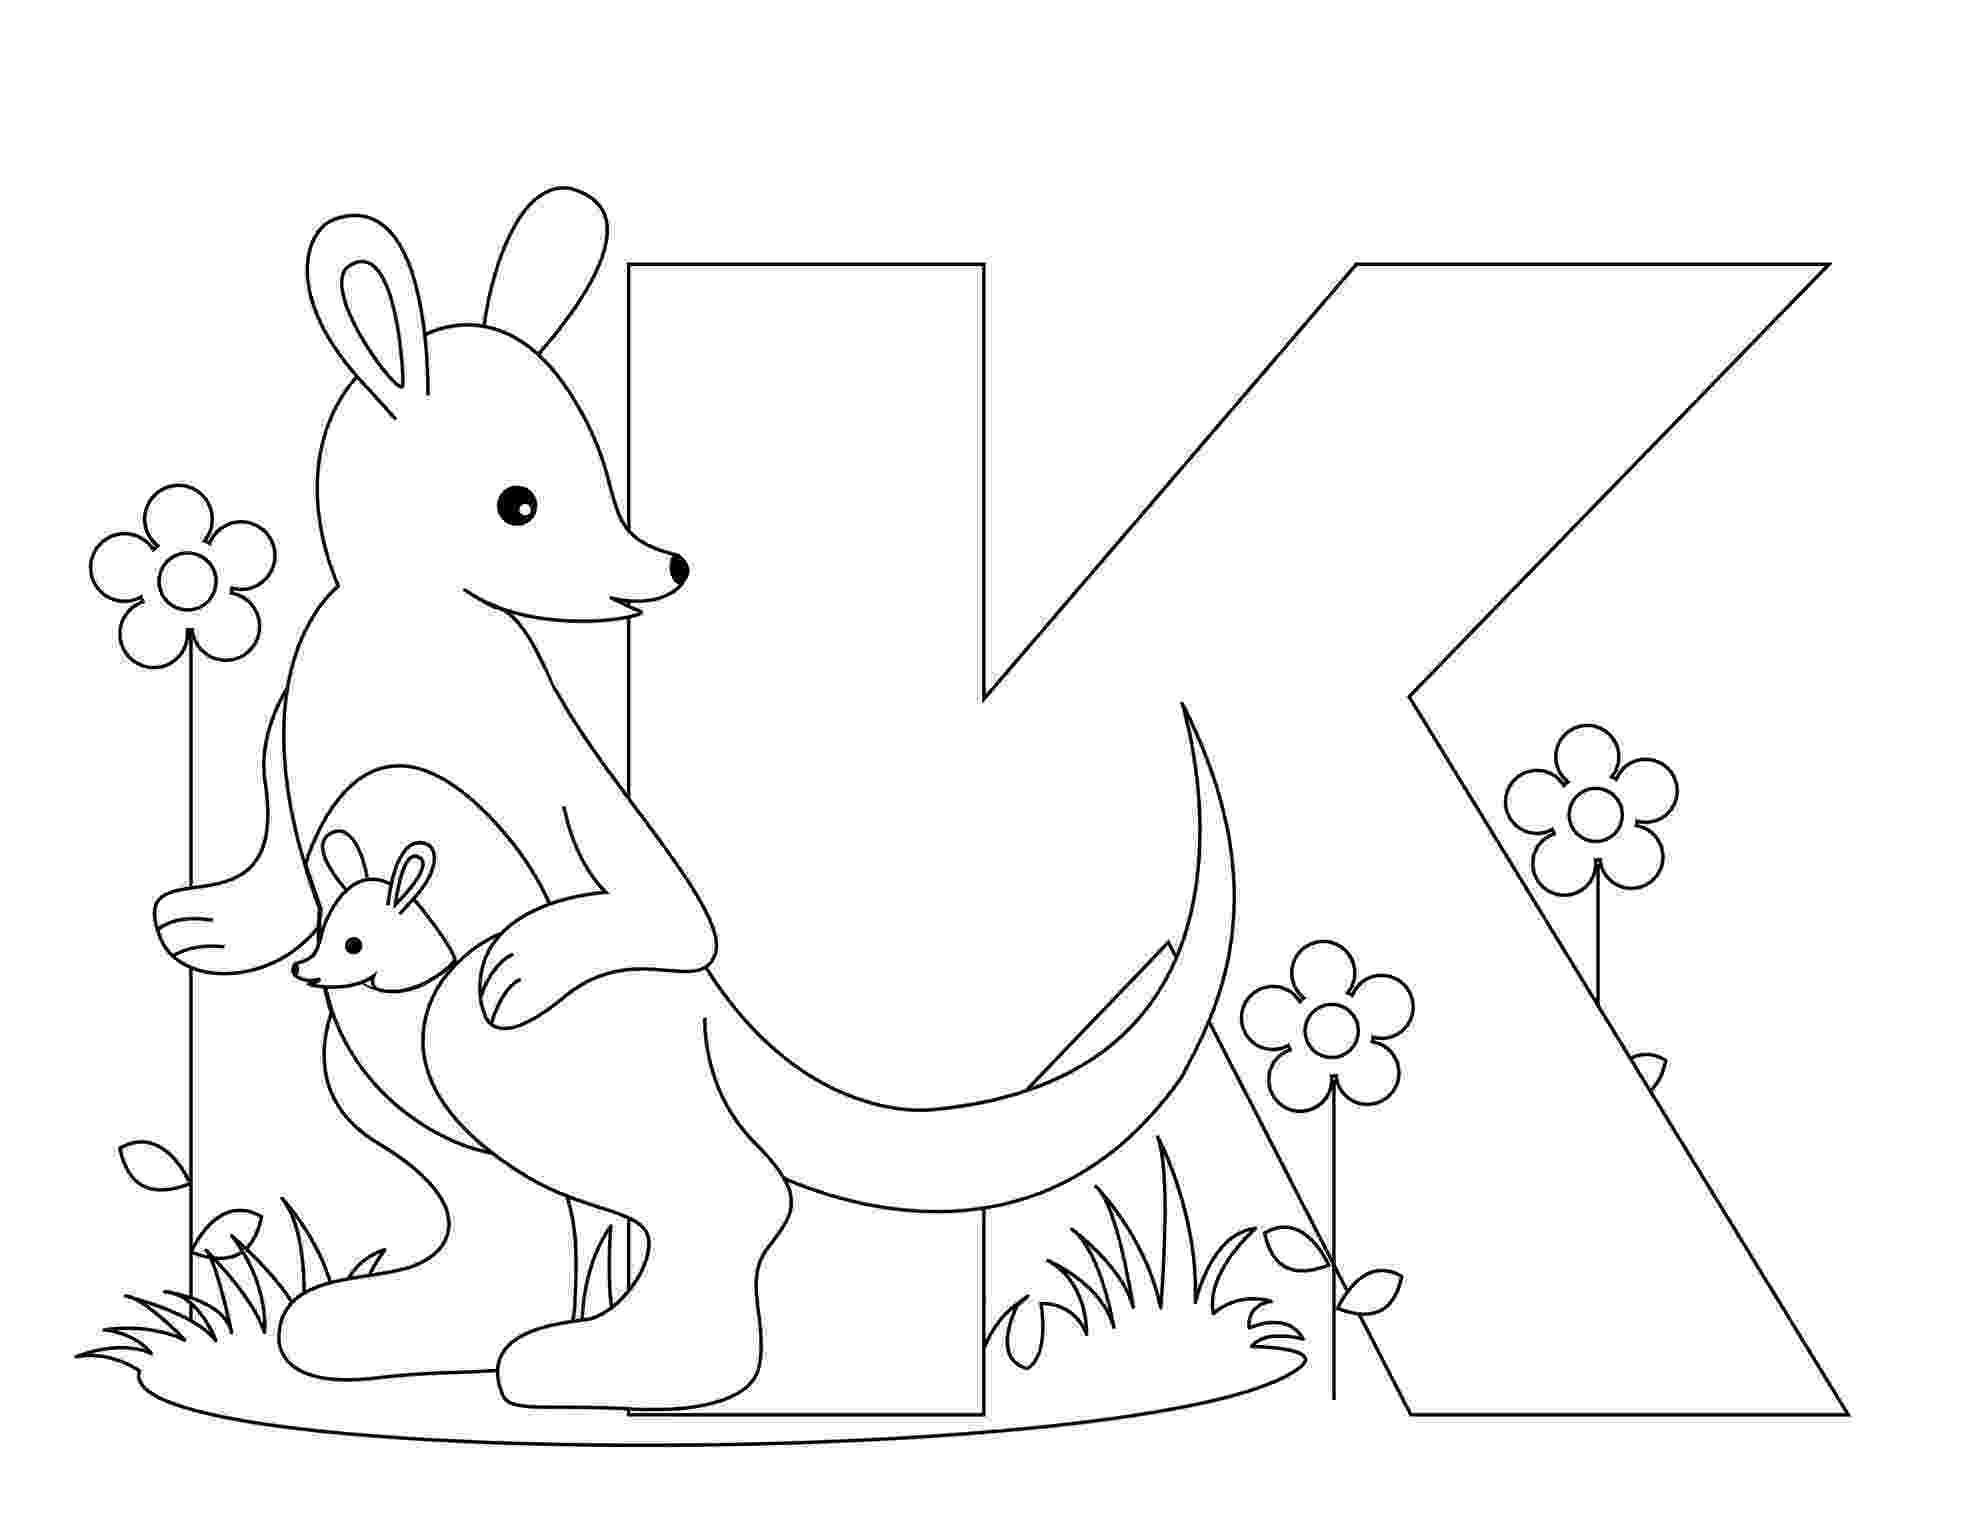 alphabet coloring free printable alphabet coloring pages for kids best alphabet coloring 1 9